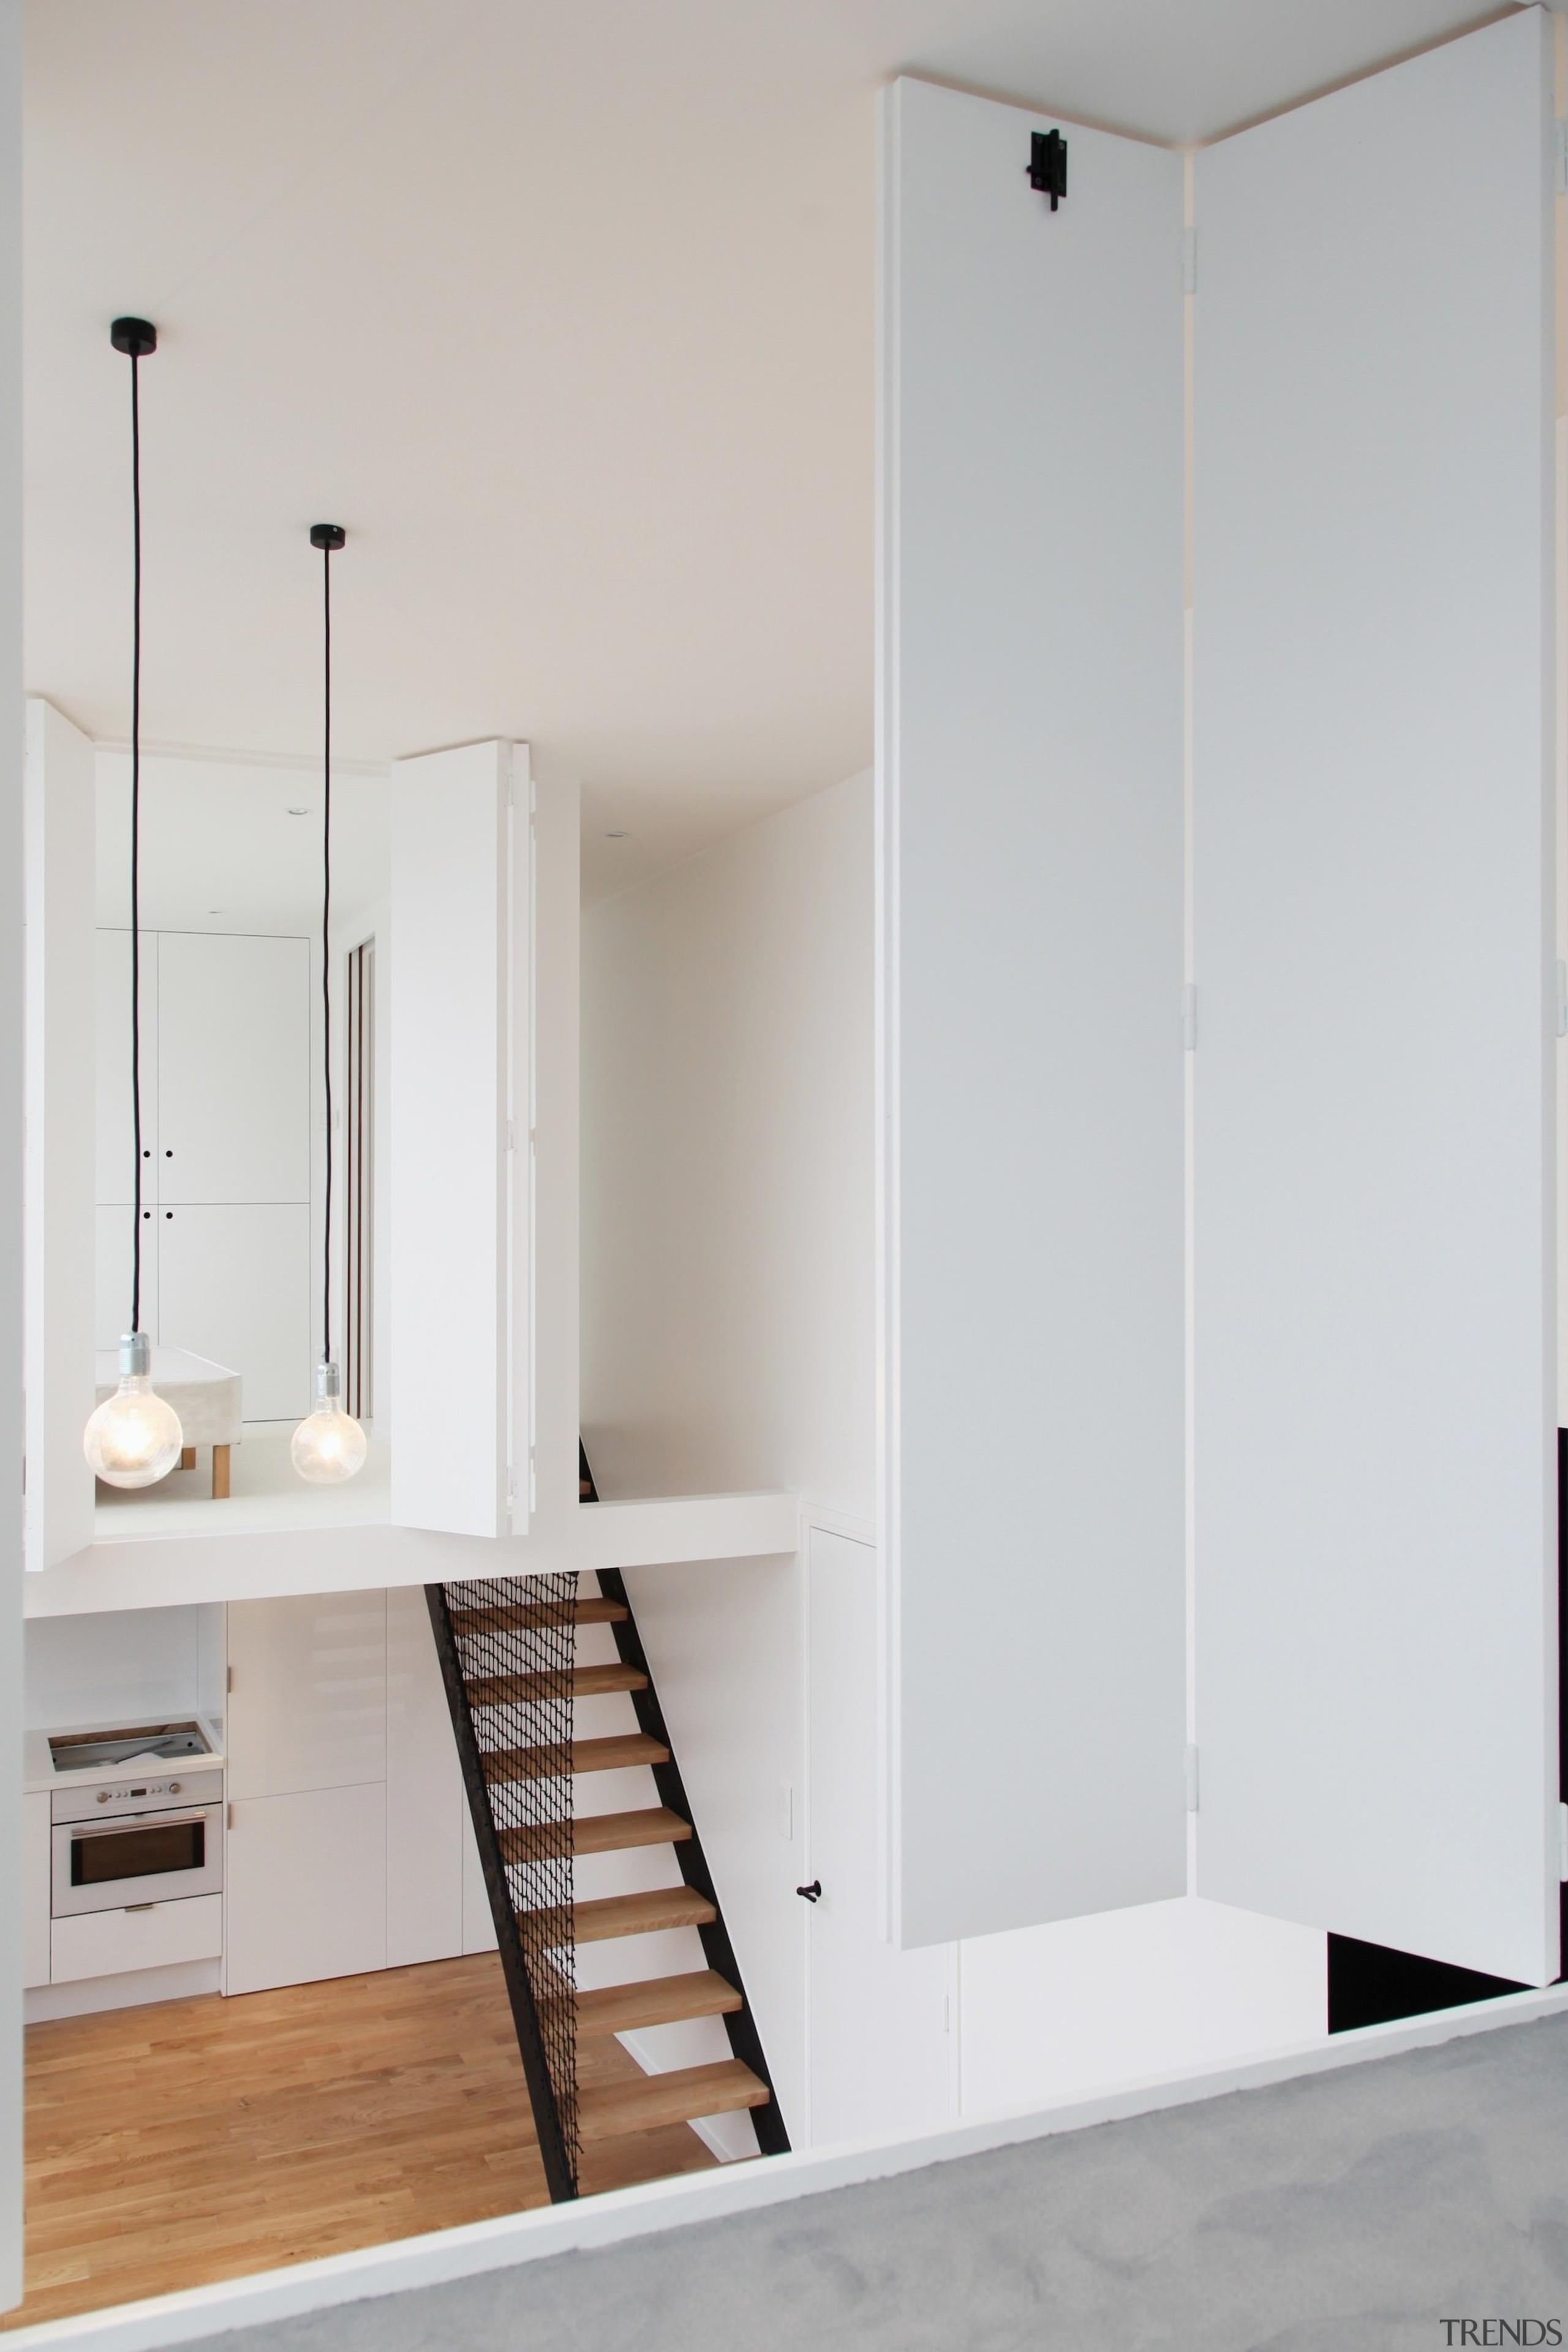 Architect: jbmn architectesPhotographer: Hermann Wendler architecture, floor, home, interior design, room, wall, wood, gray